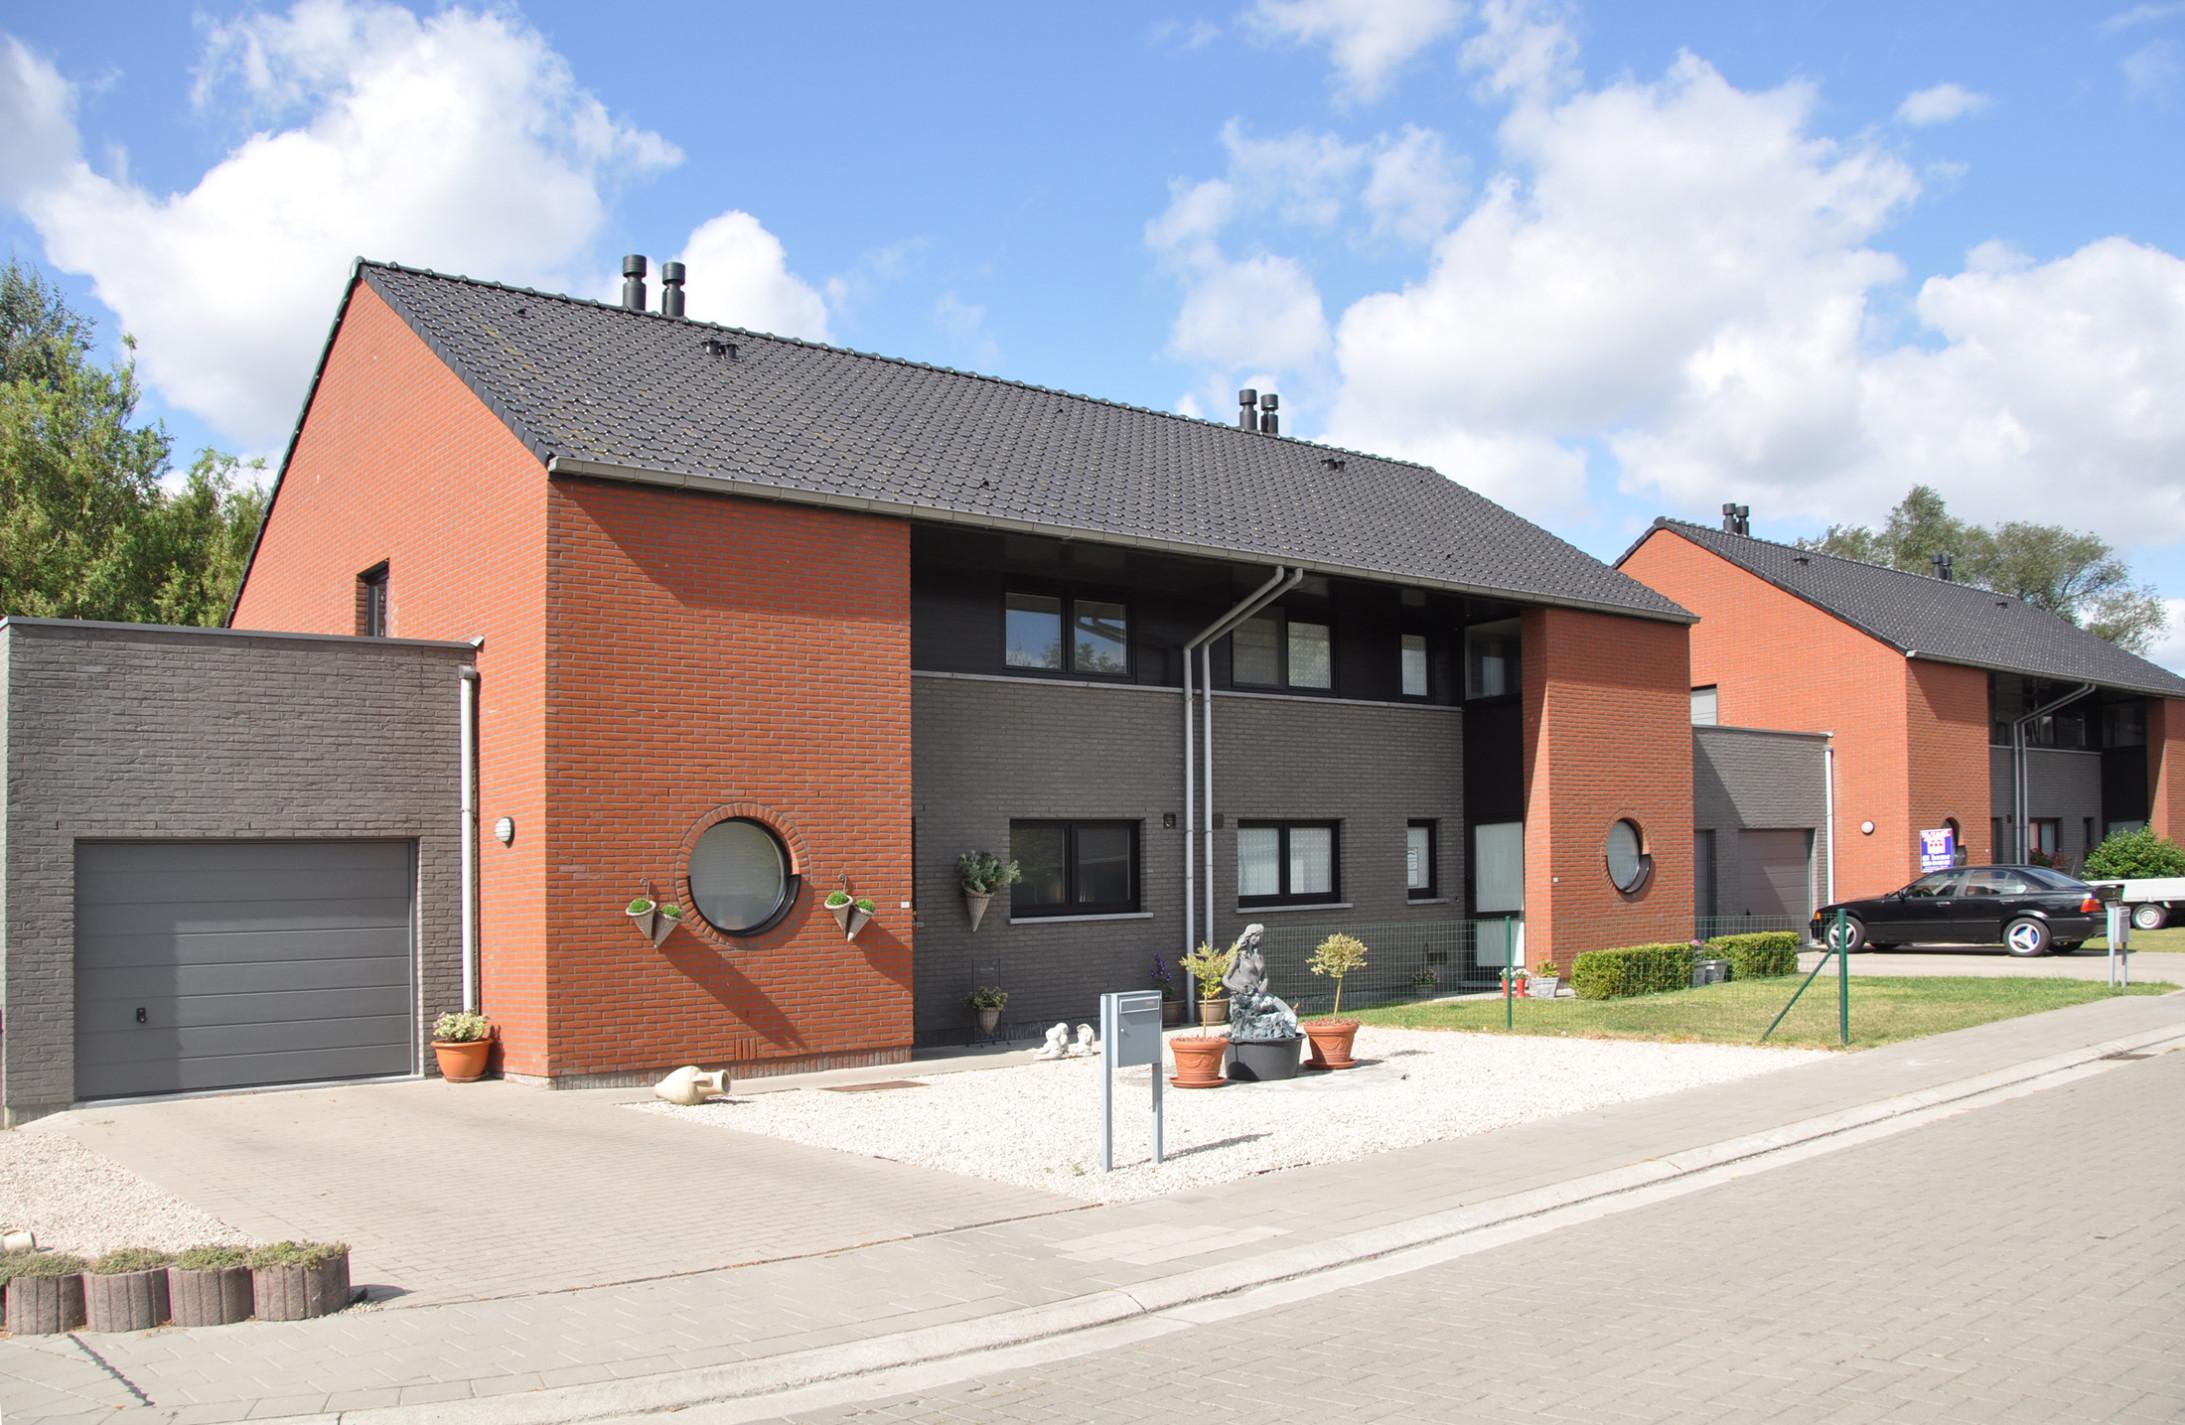 Sociale huisvesting1_Zonnbeke_Claeys Architecten.jpg